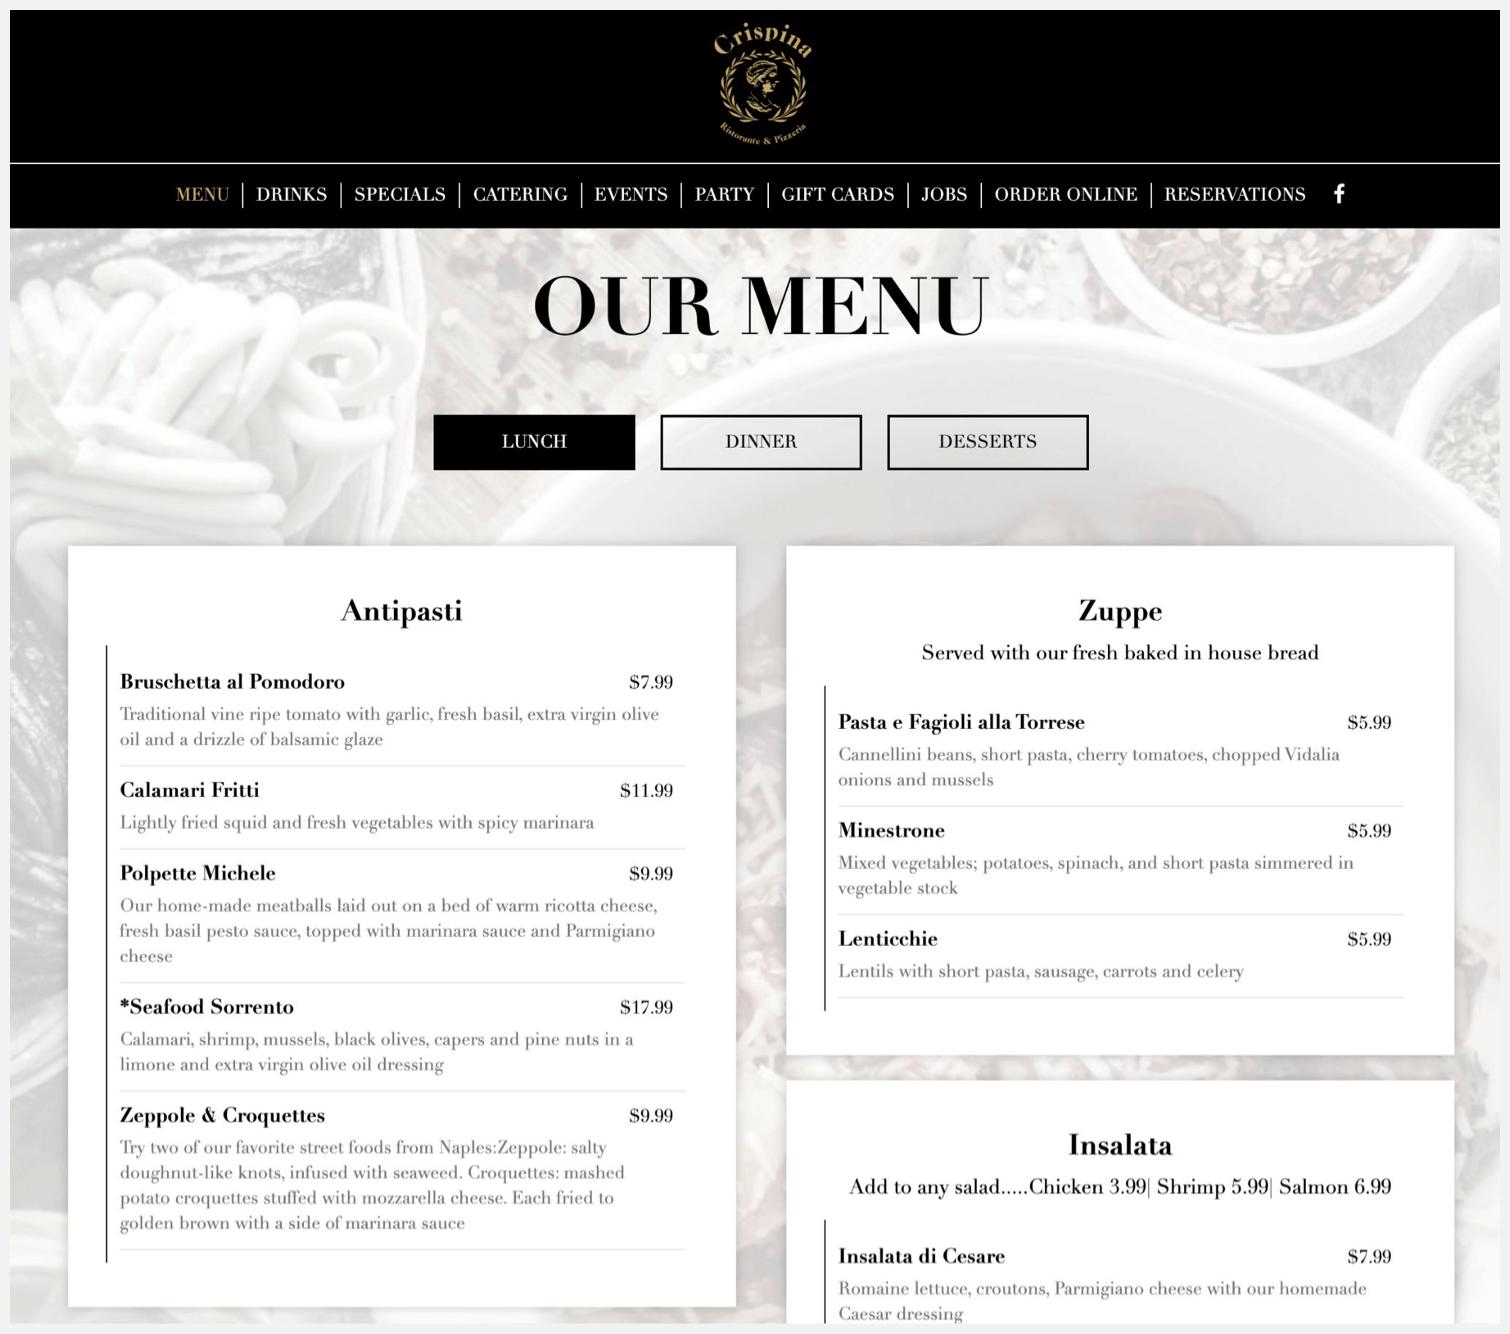 Crispina Ristorante & Pizzeria menu page on their website.